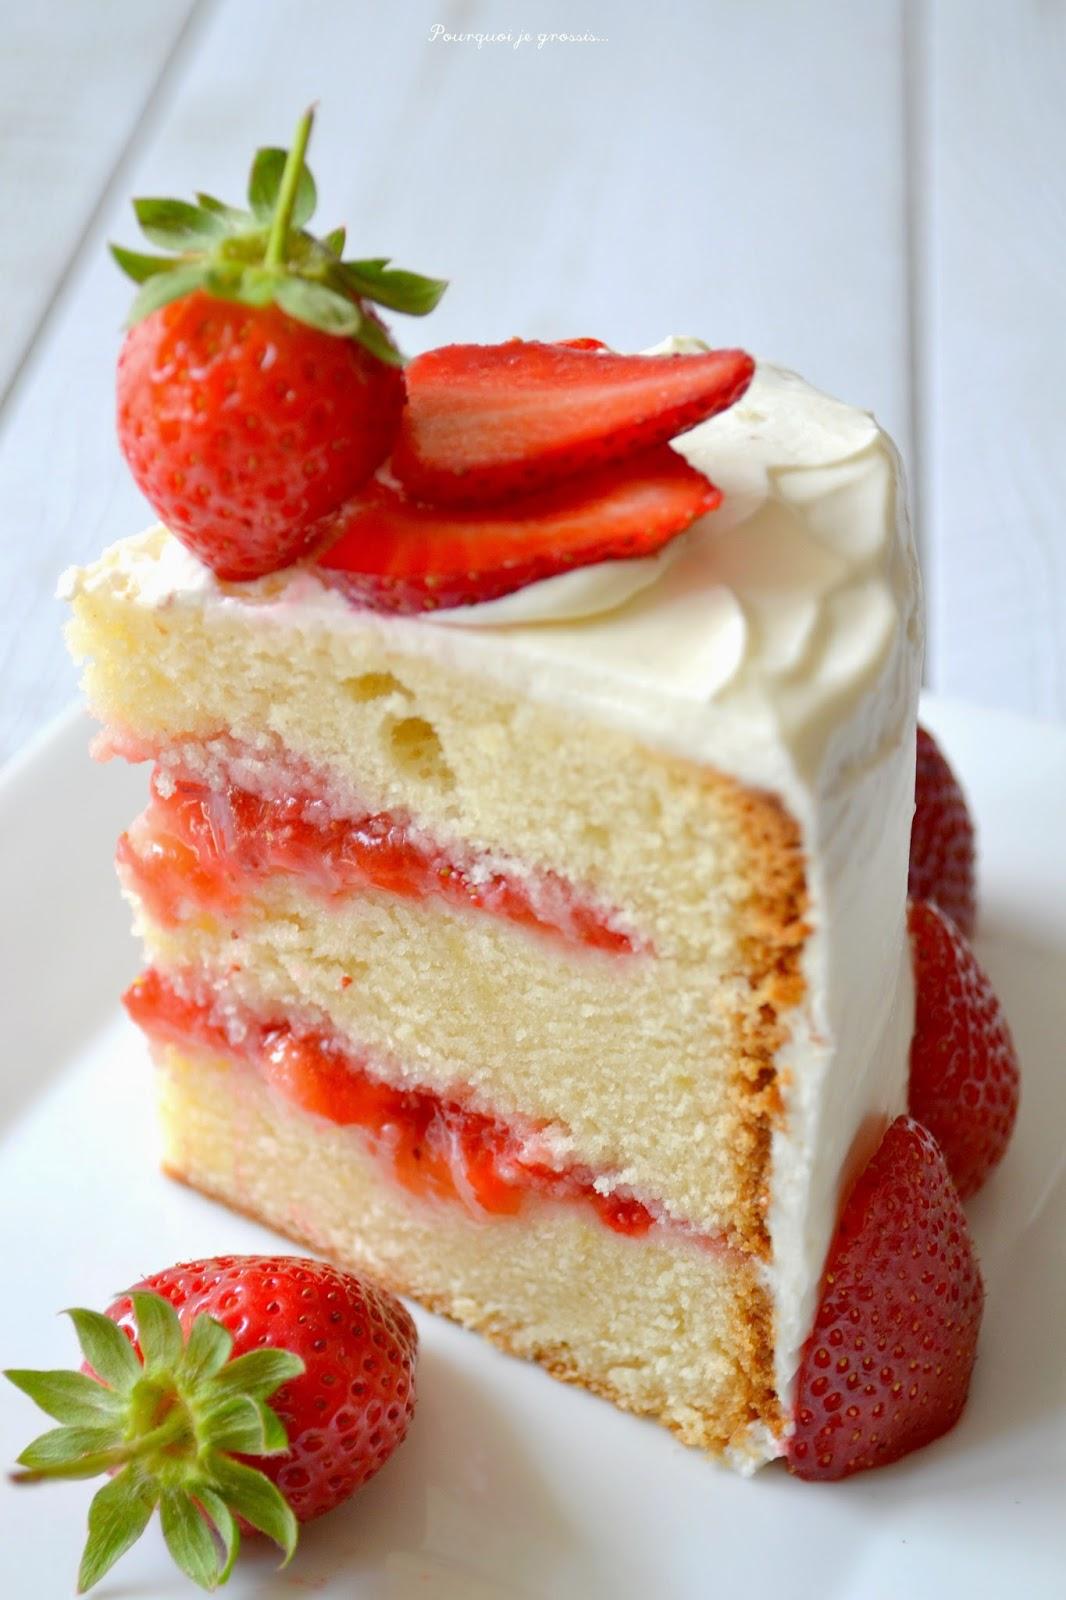 Recette Cake Design Fraise : Layer cake fraises & citron